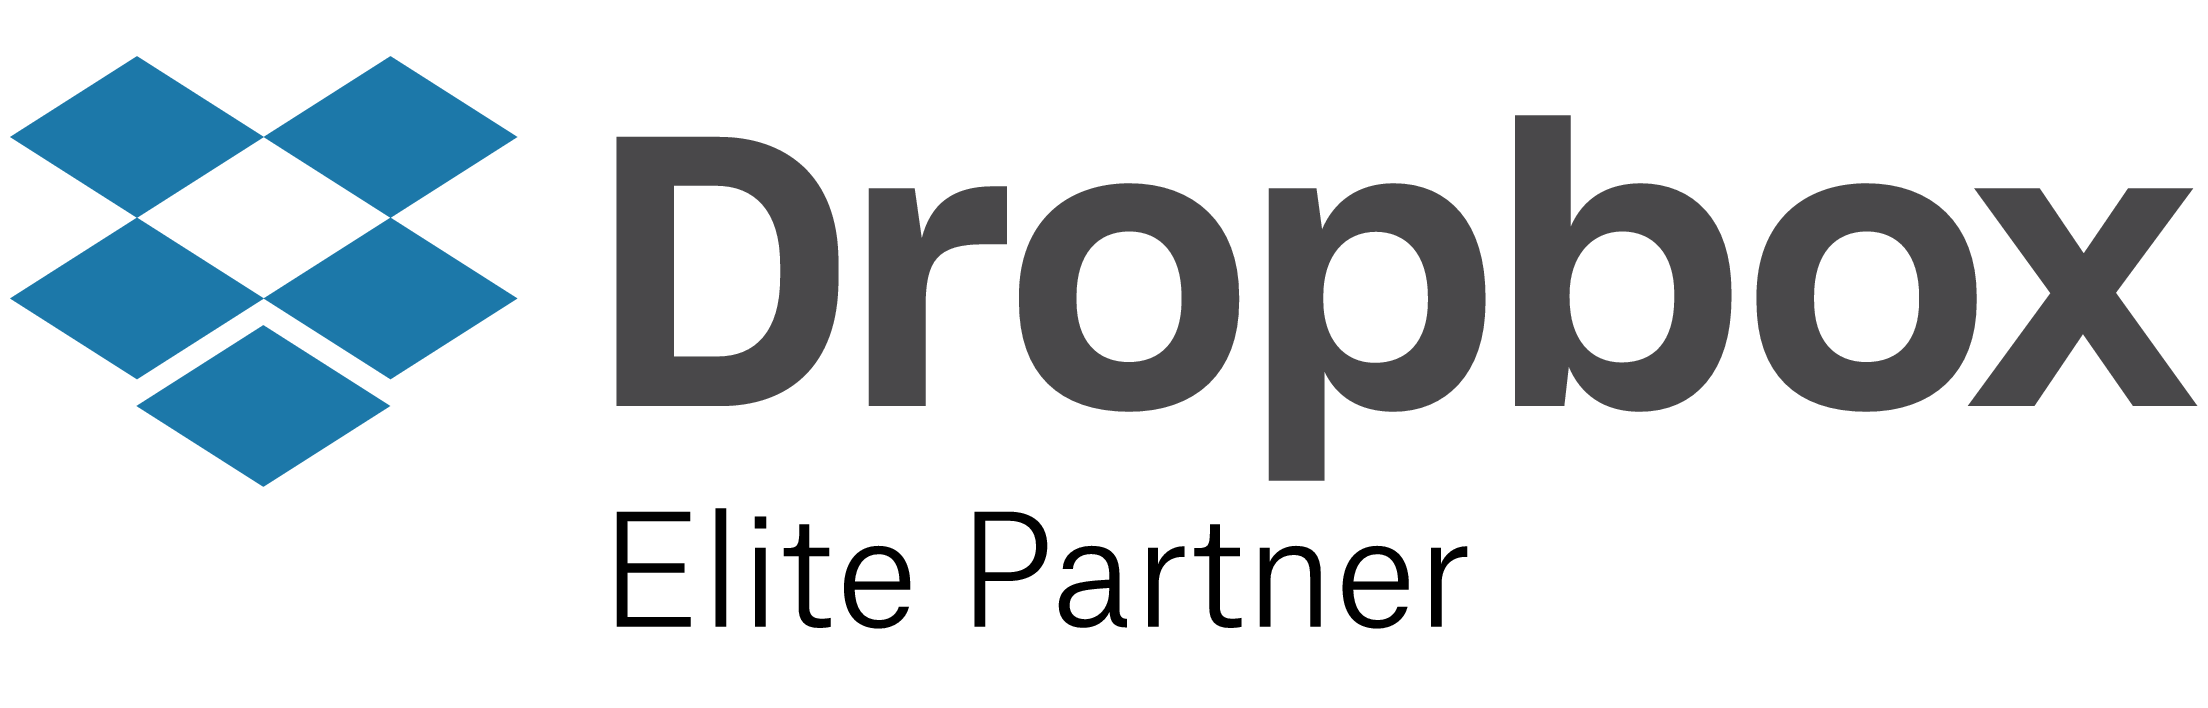 Dropbox Business, Dropbox Business